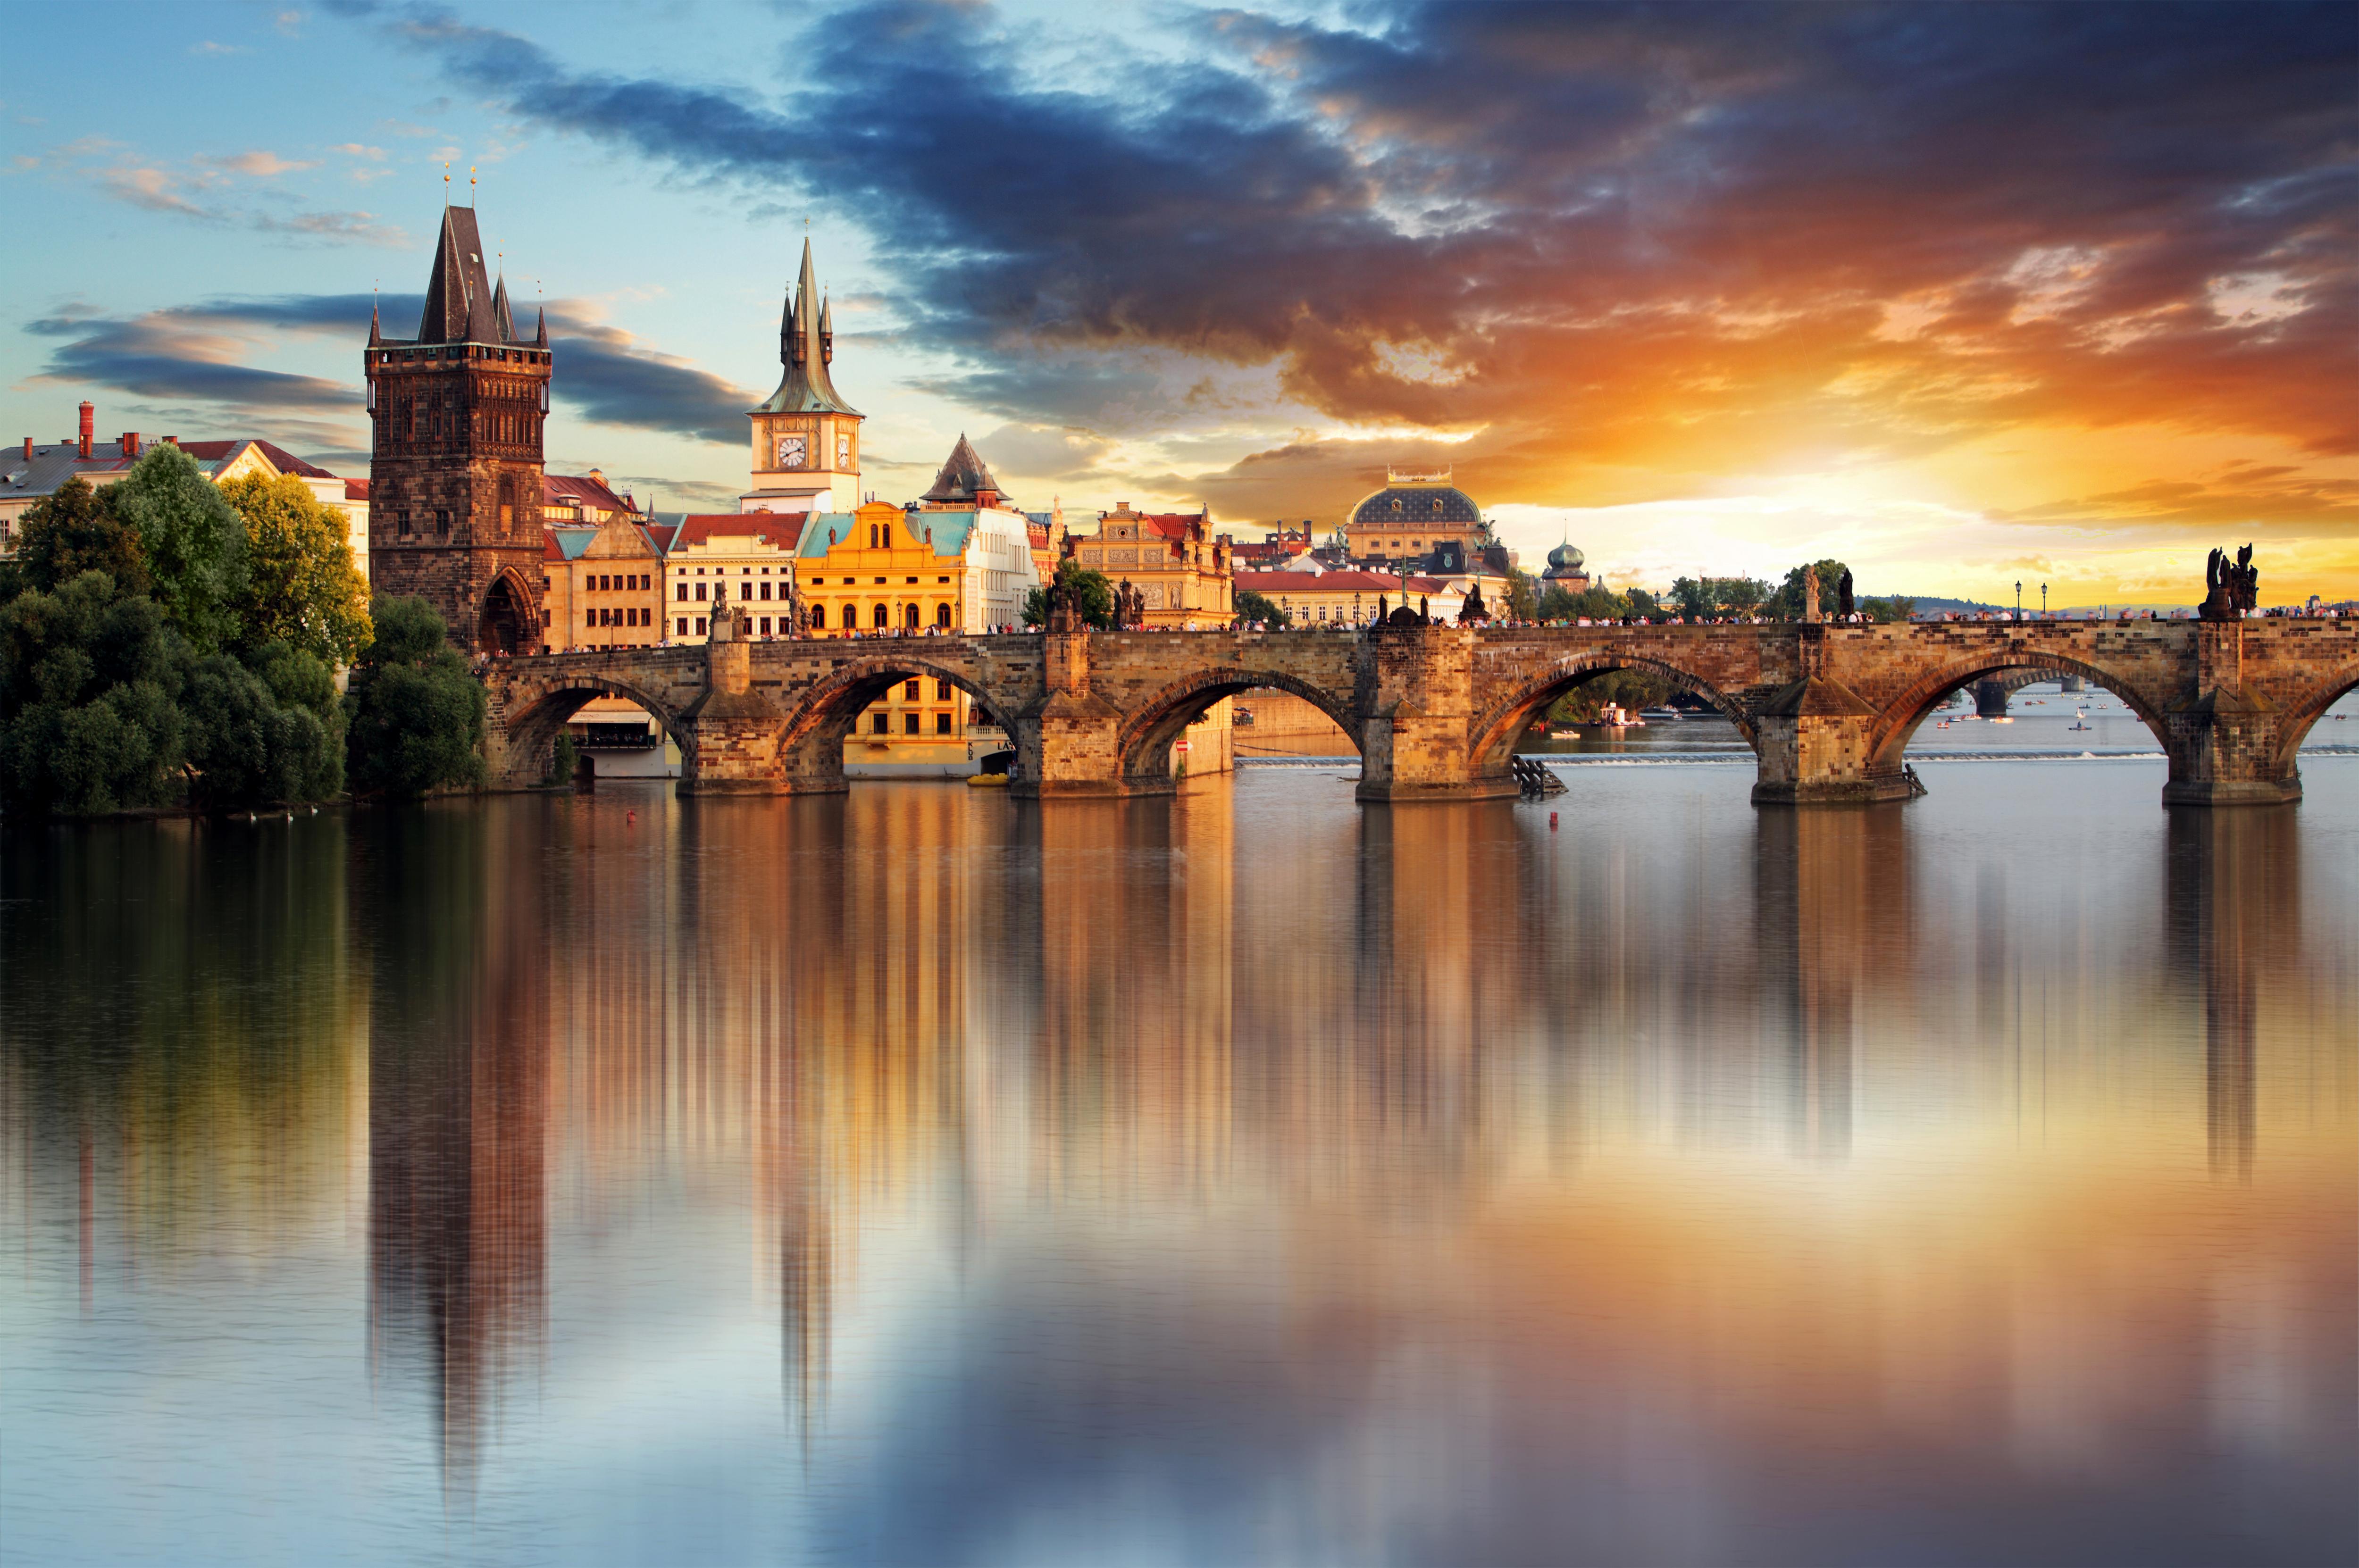 Charles Bridge Prague Wallpaper Gallery Yopriceville   High 5000x3324